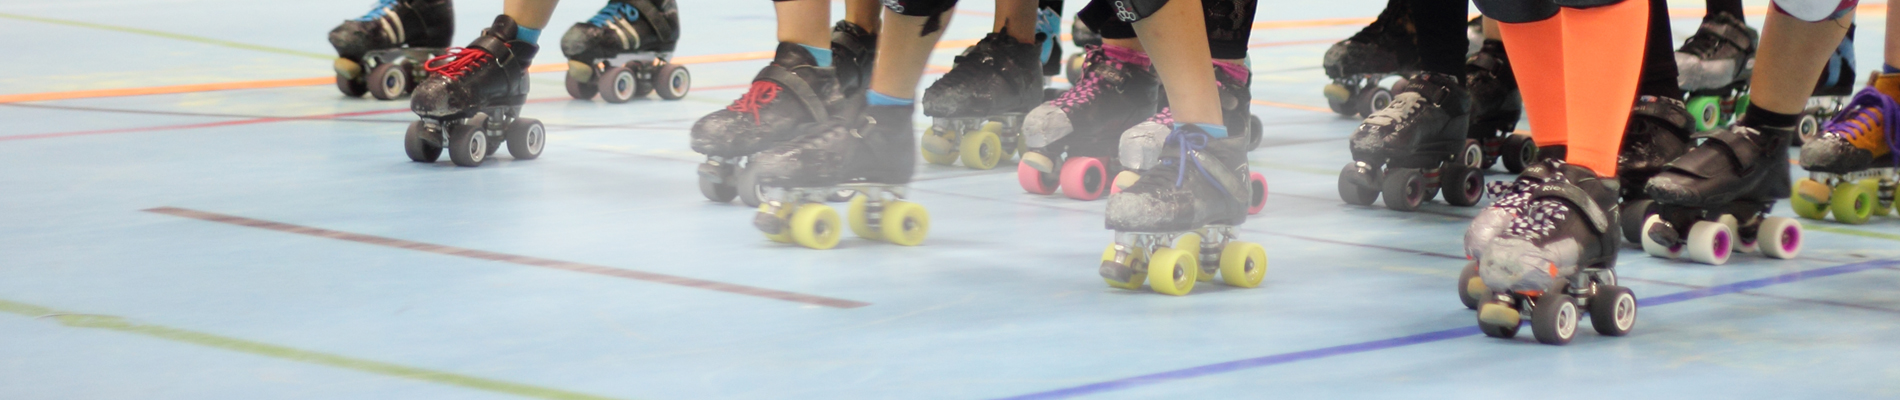 roller-derby-regina-pile-o-bones-callie